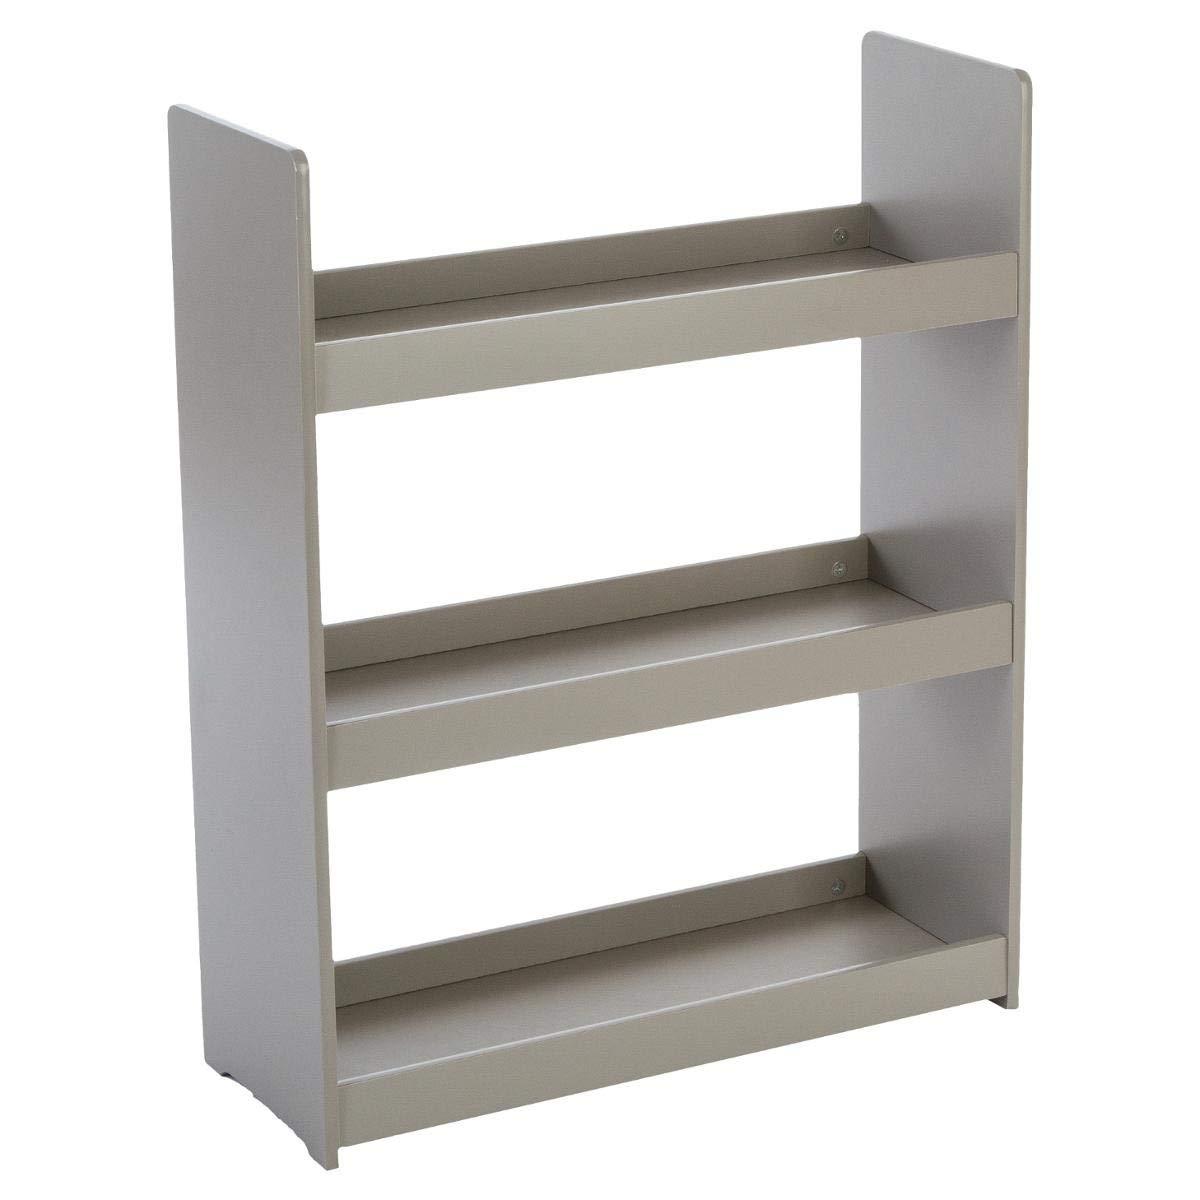 Children's wooden bookcase - 3 shelves - Colour TAUPE ATMOSPHERA